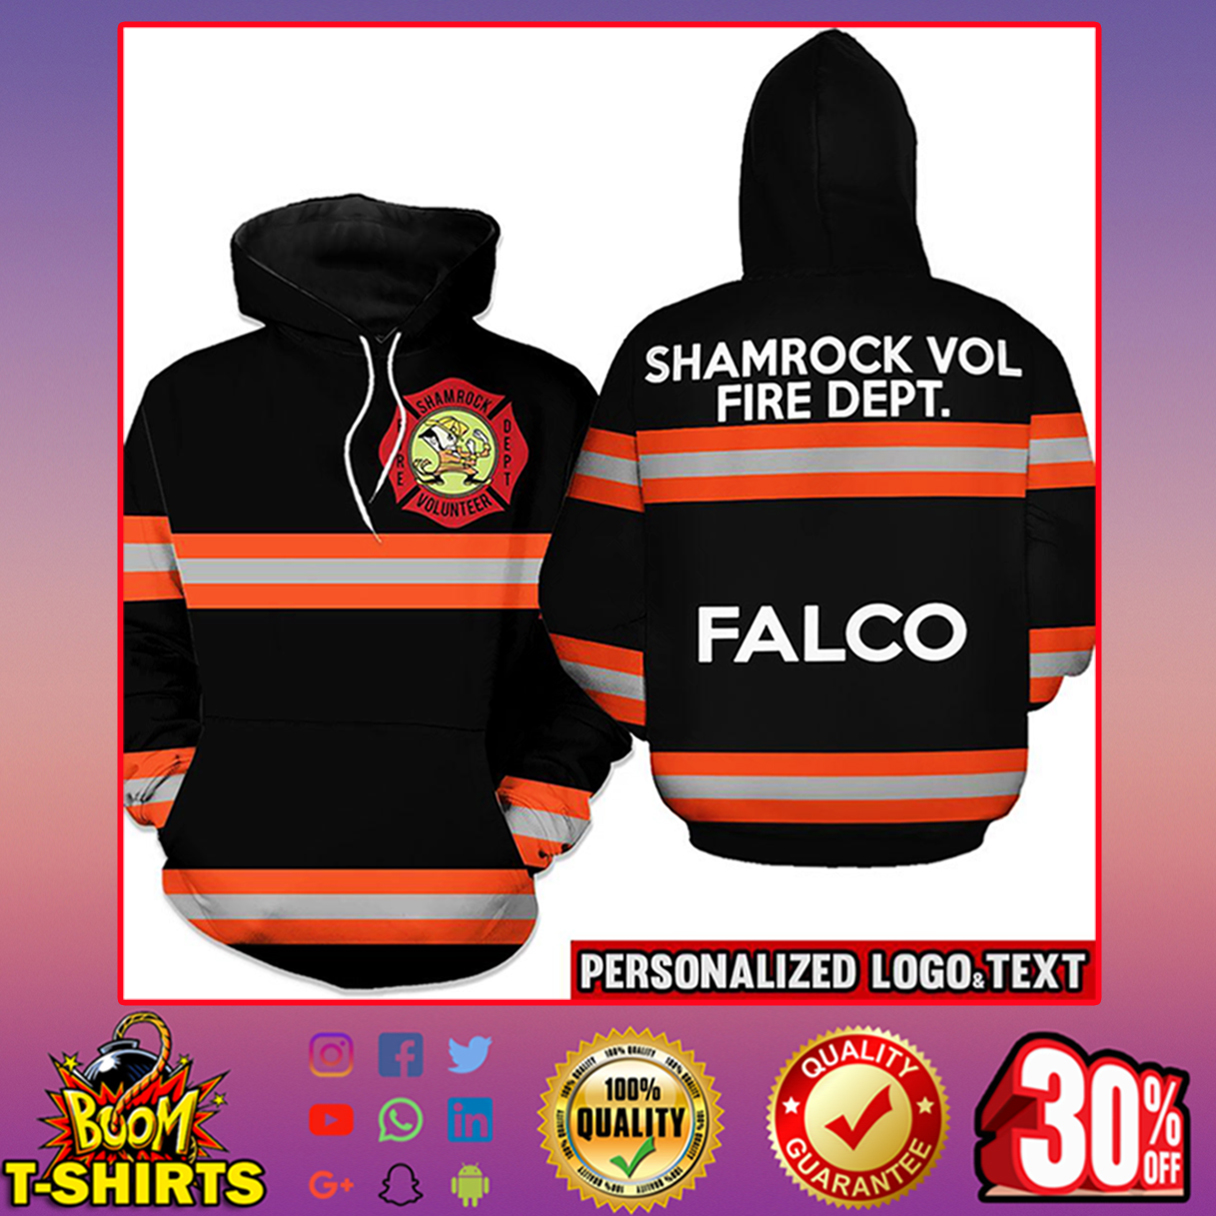 Firefighter Shamrock Volunteer Fire Dept. Falco Hoodie 3d - orange line - black